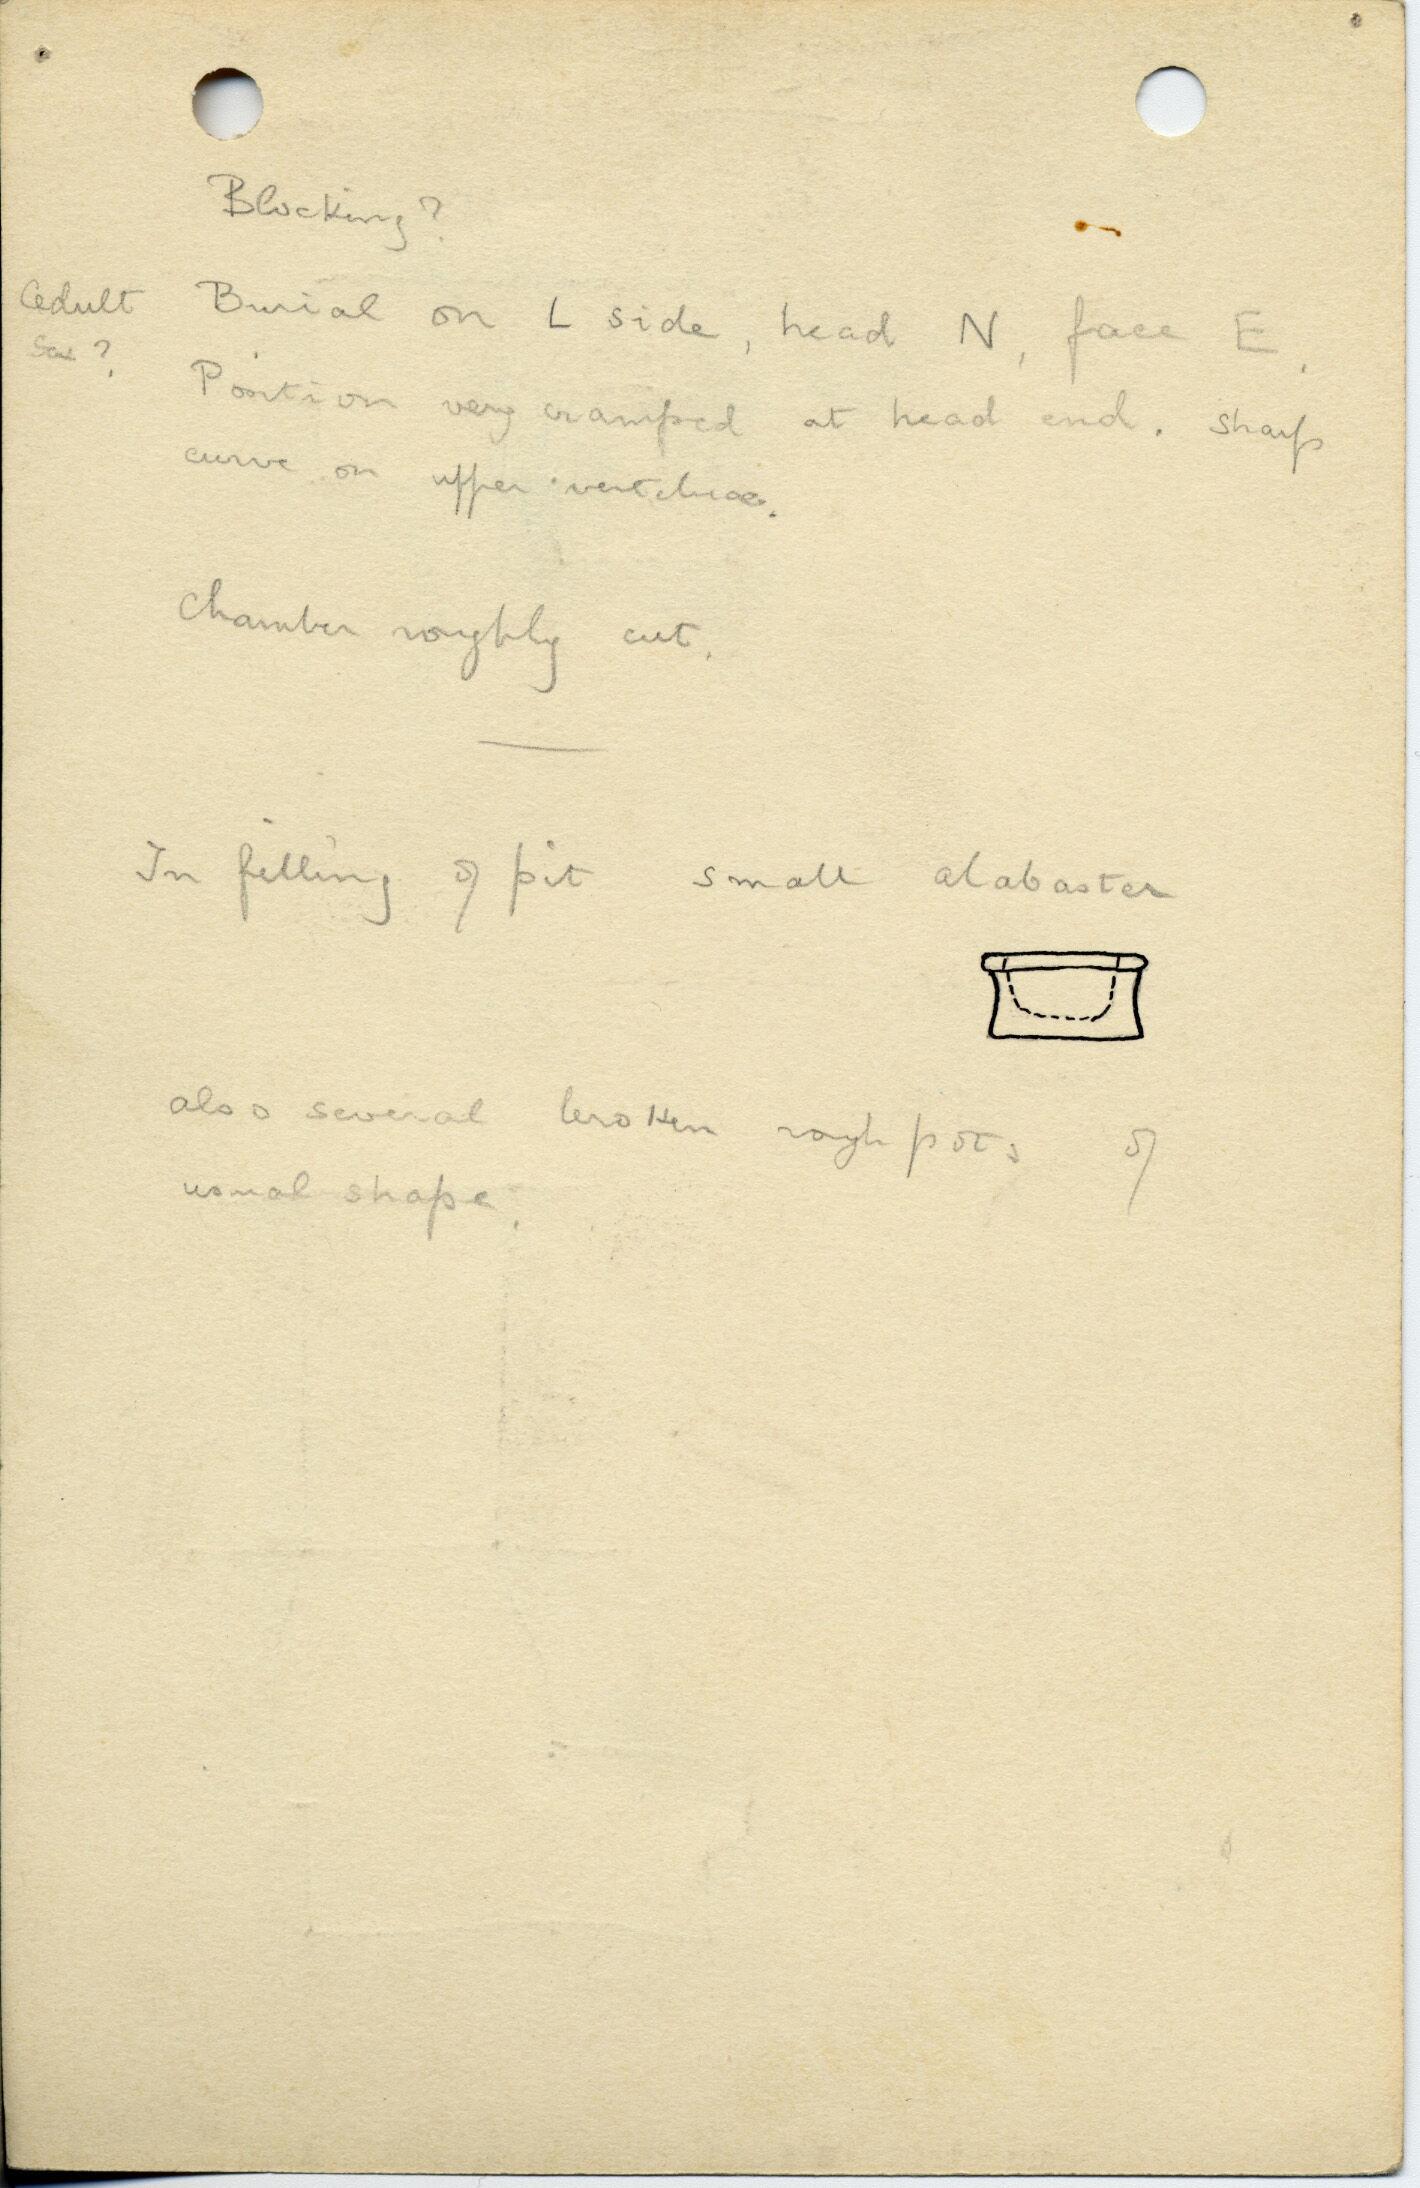 Notes: G 1022, Shaft J, notes